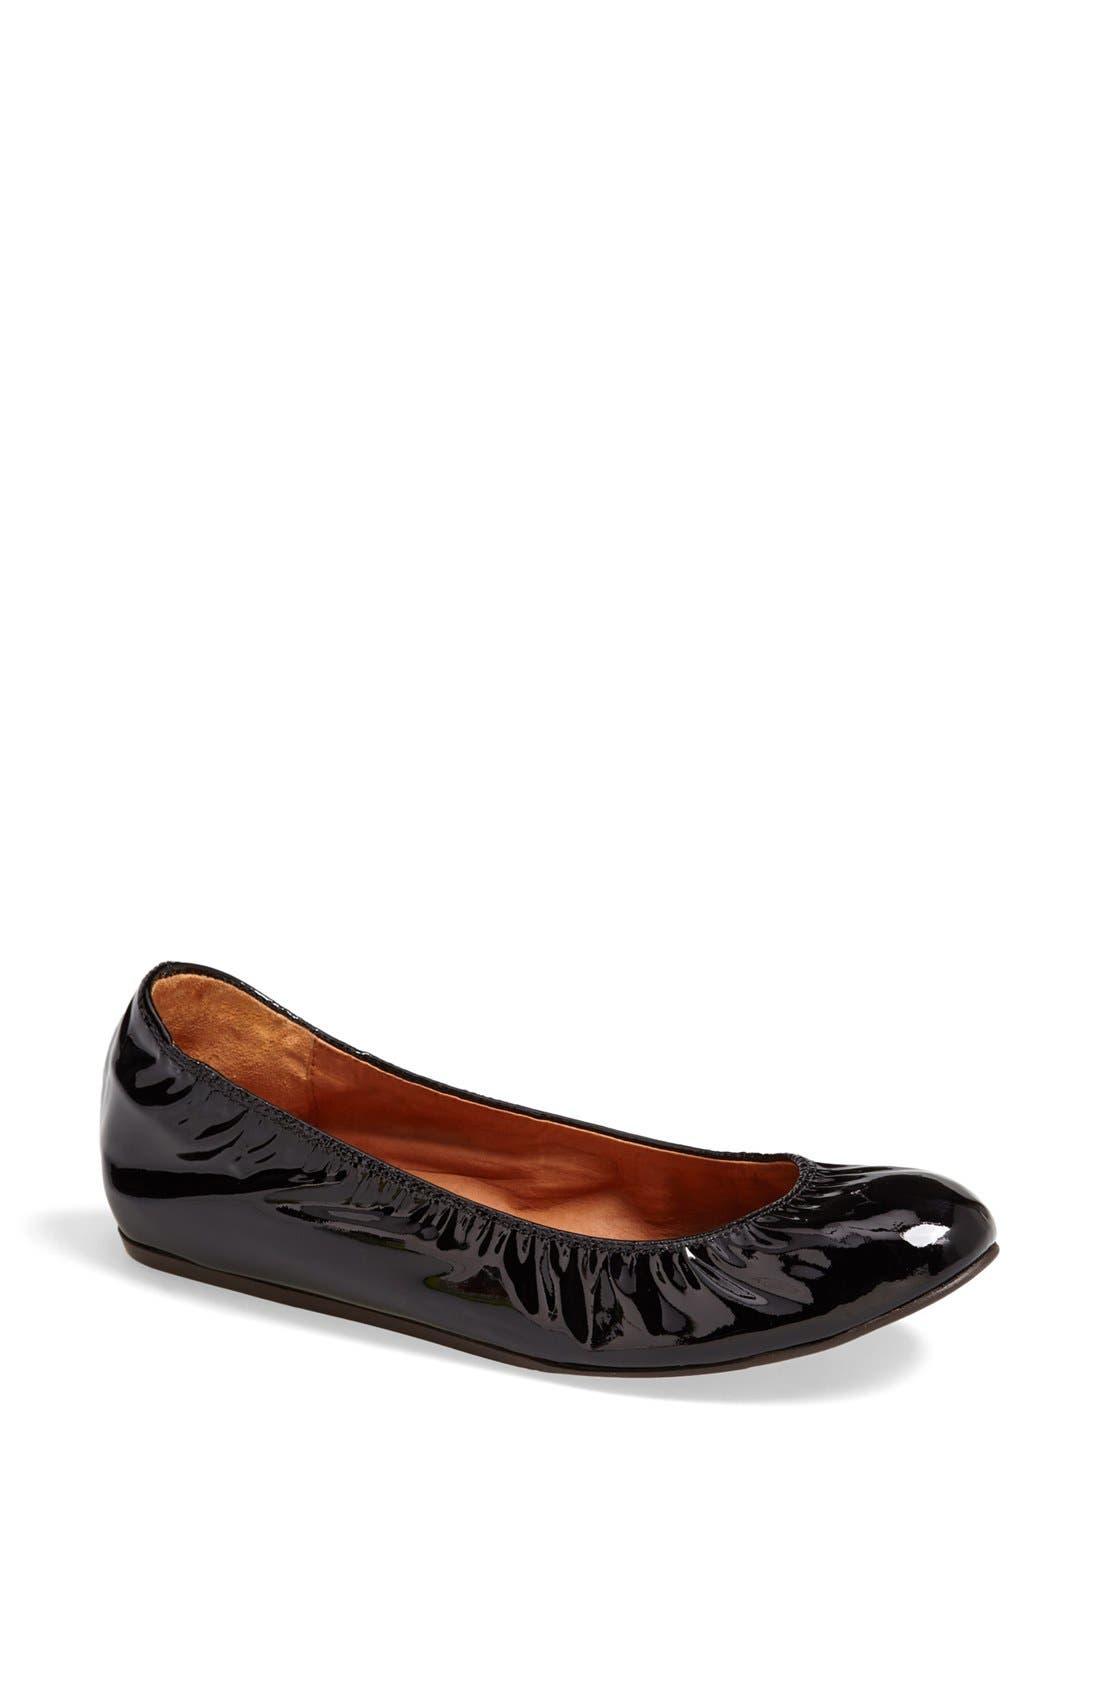 Alternate Image 1 Selected - Lanvin Patent Leather Ballerina Flat